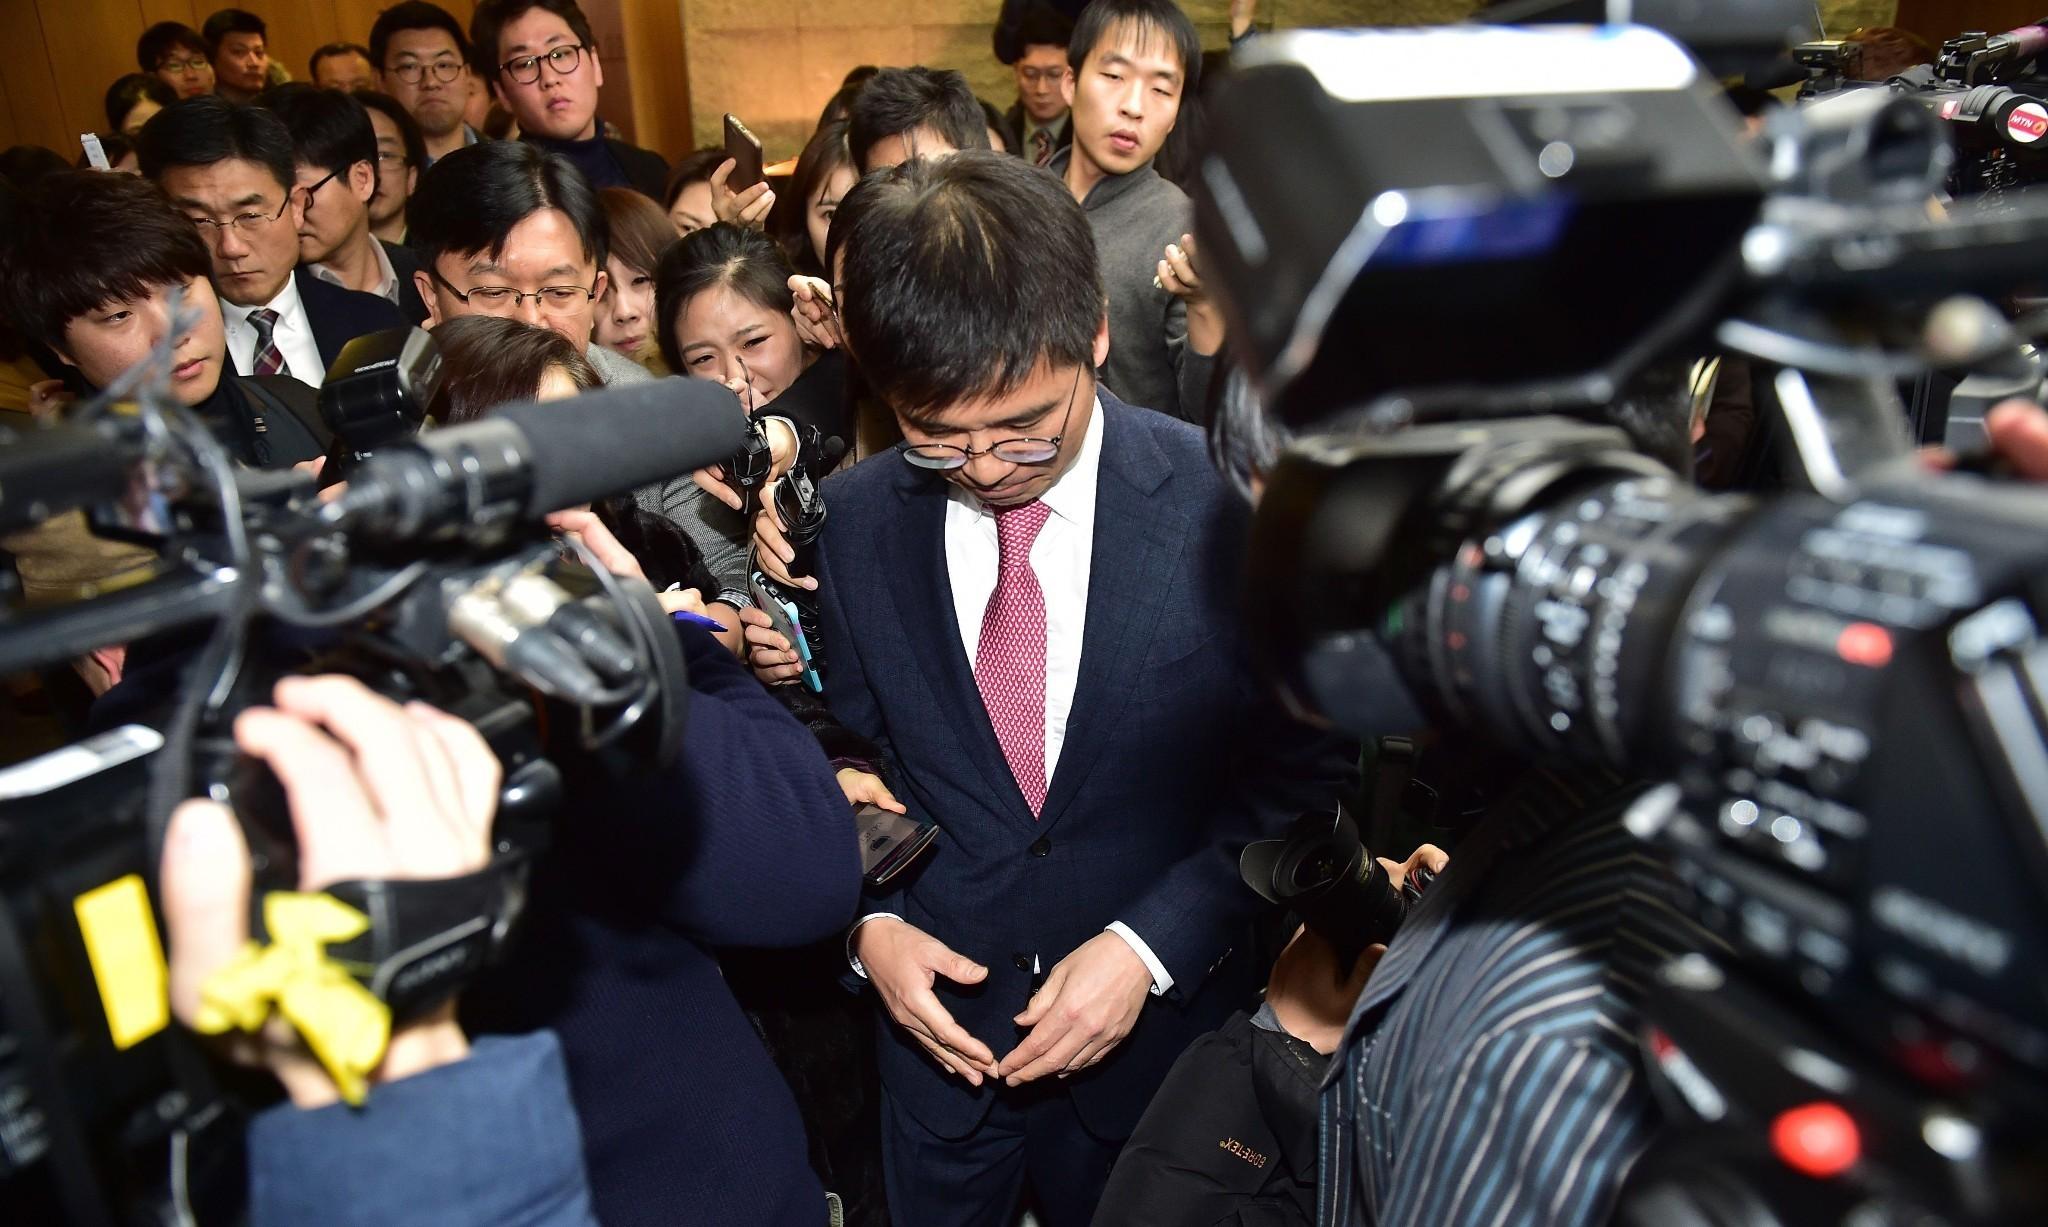 Workers seeking cancer compensation dispute 'final settlement' from Samsung